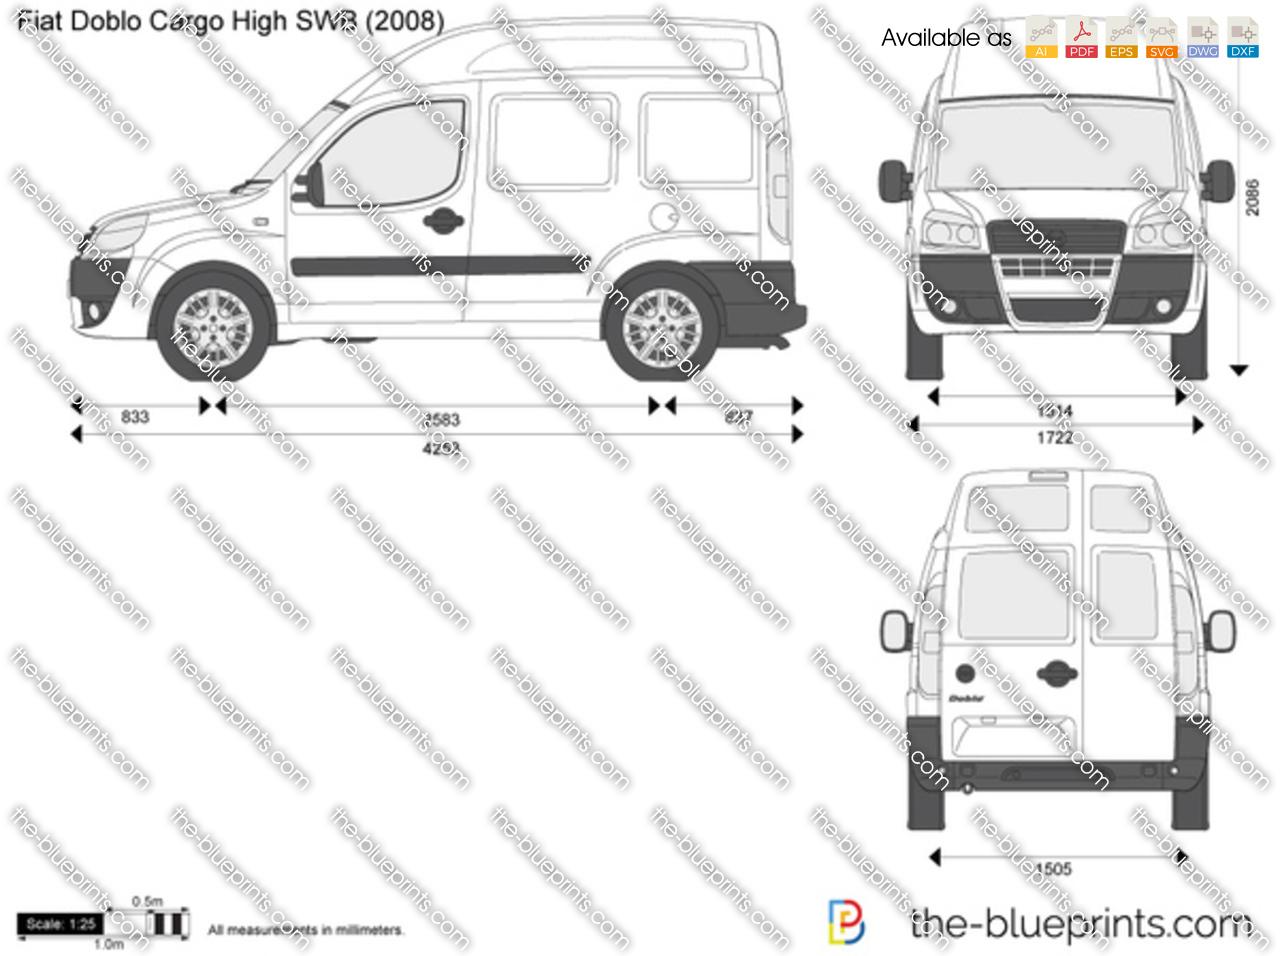 Fiat Ducato Repair Manuals Service Manuals Electrical Wiring